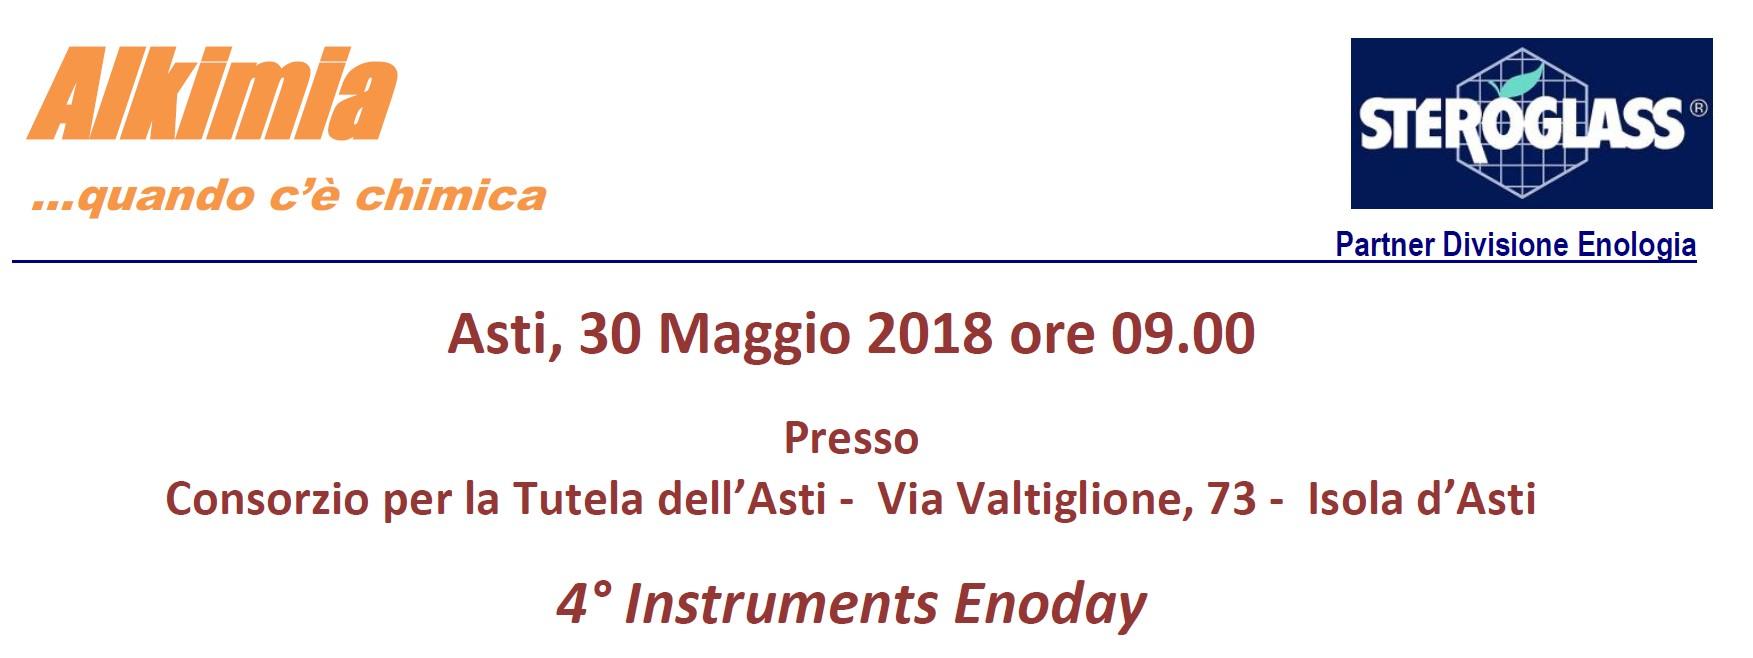 4° Instruments Enoday - Piemonte 2018